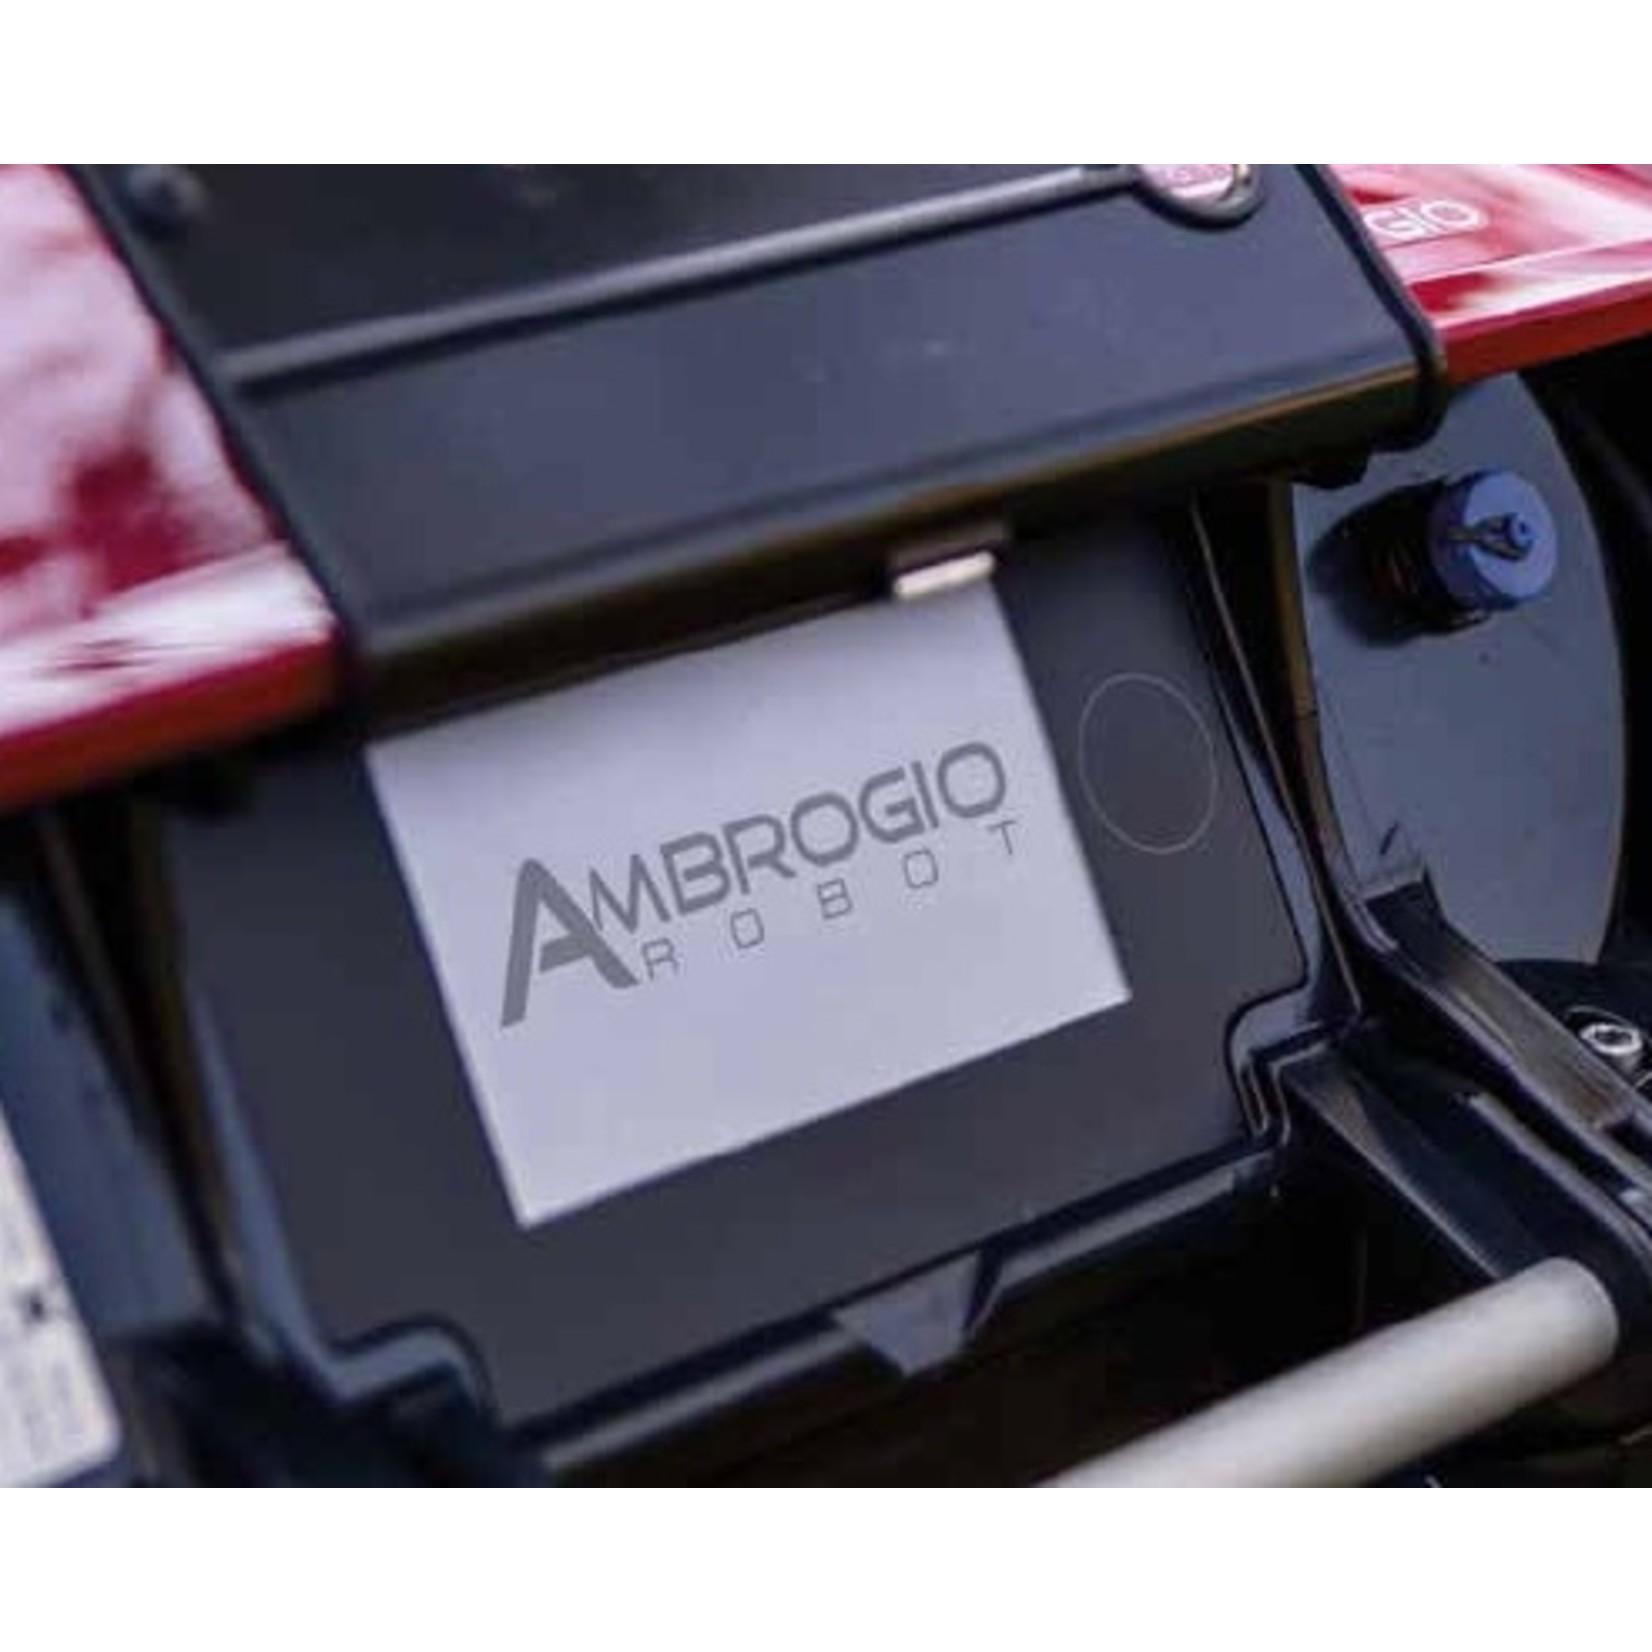 Ambrogio Ambrogio Proline L250i Elite Rasenmähroboter Modell 2021